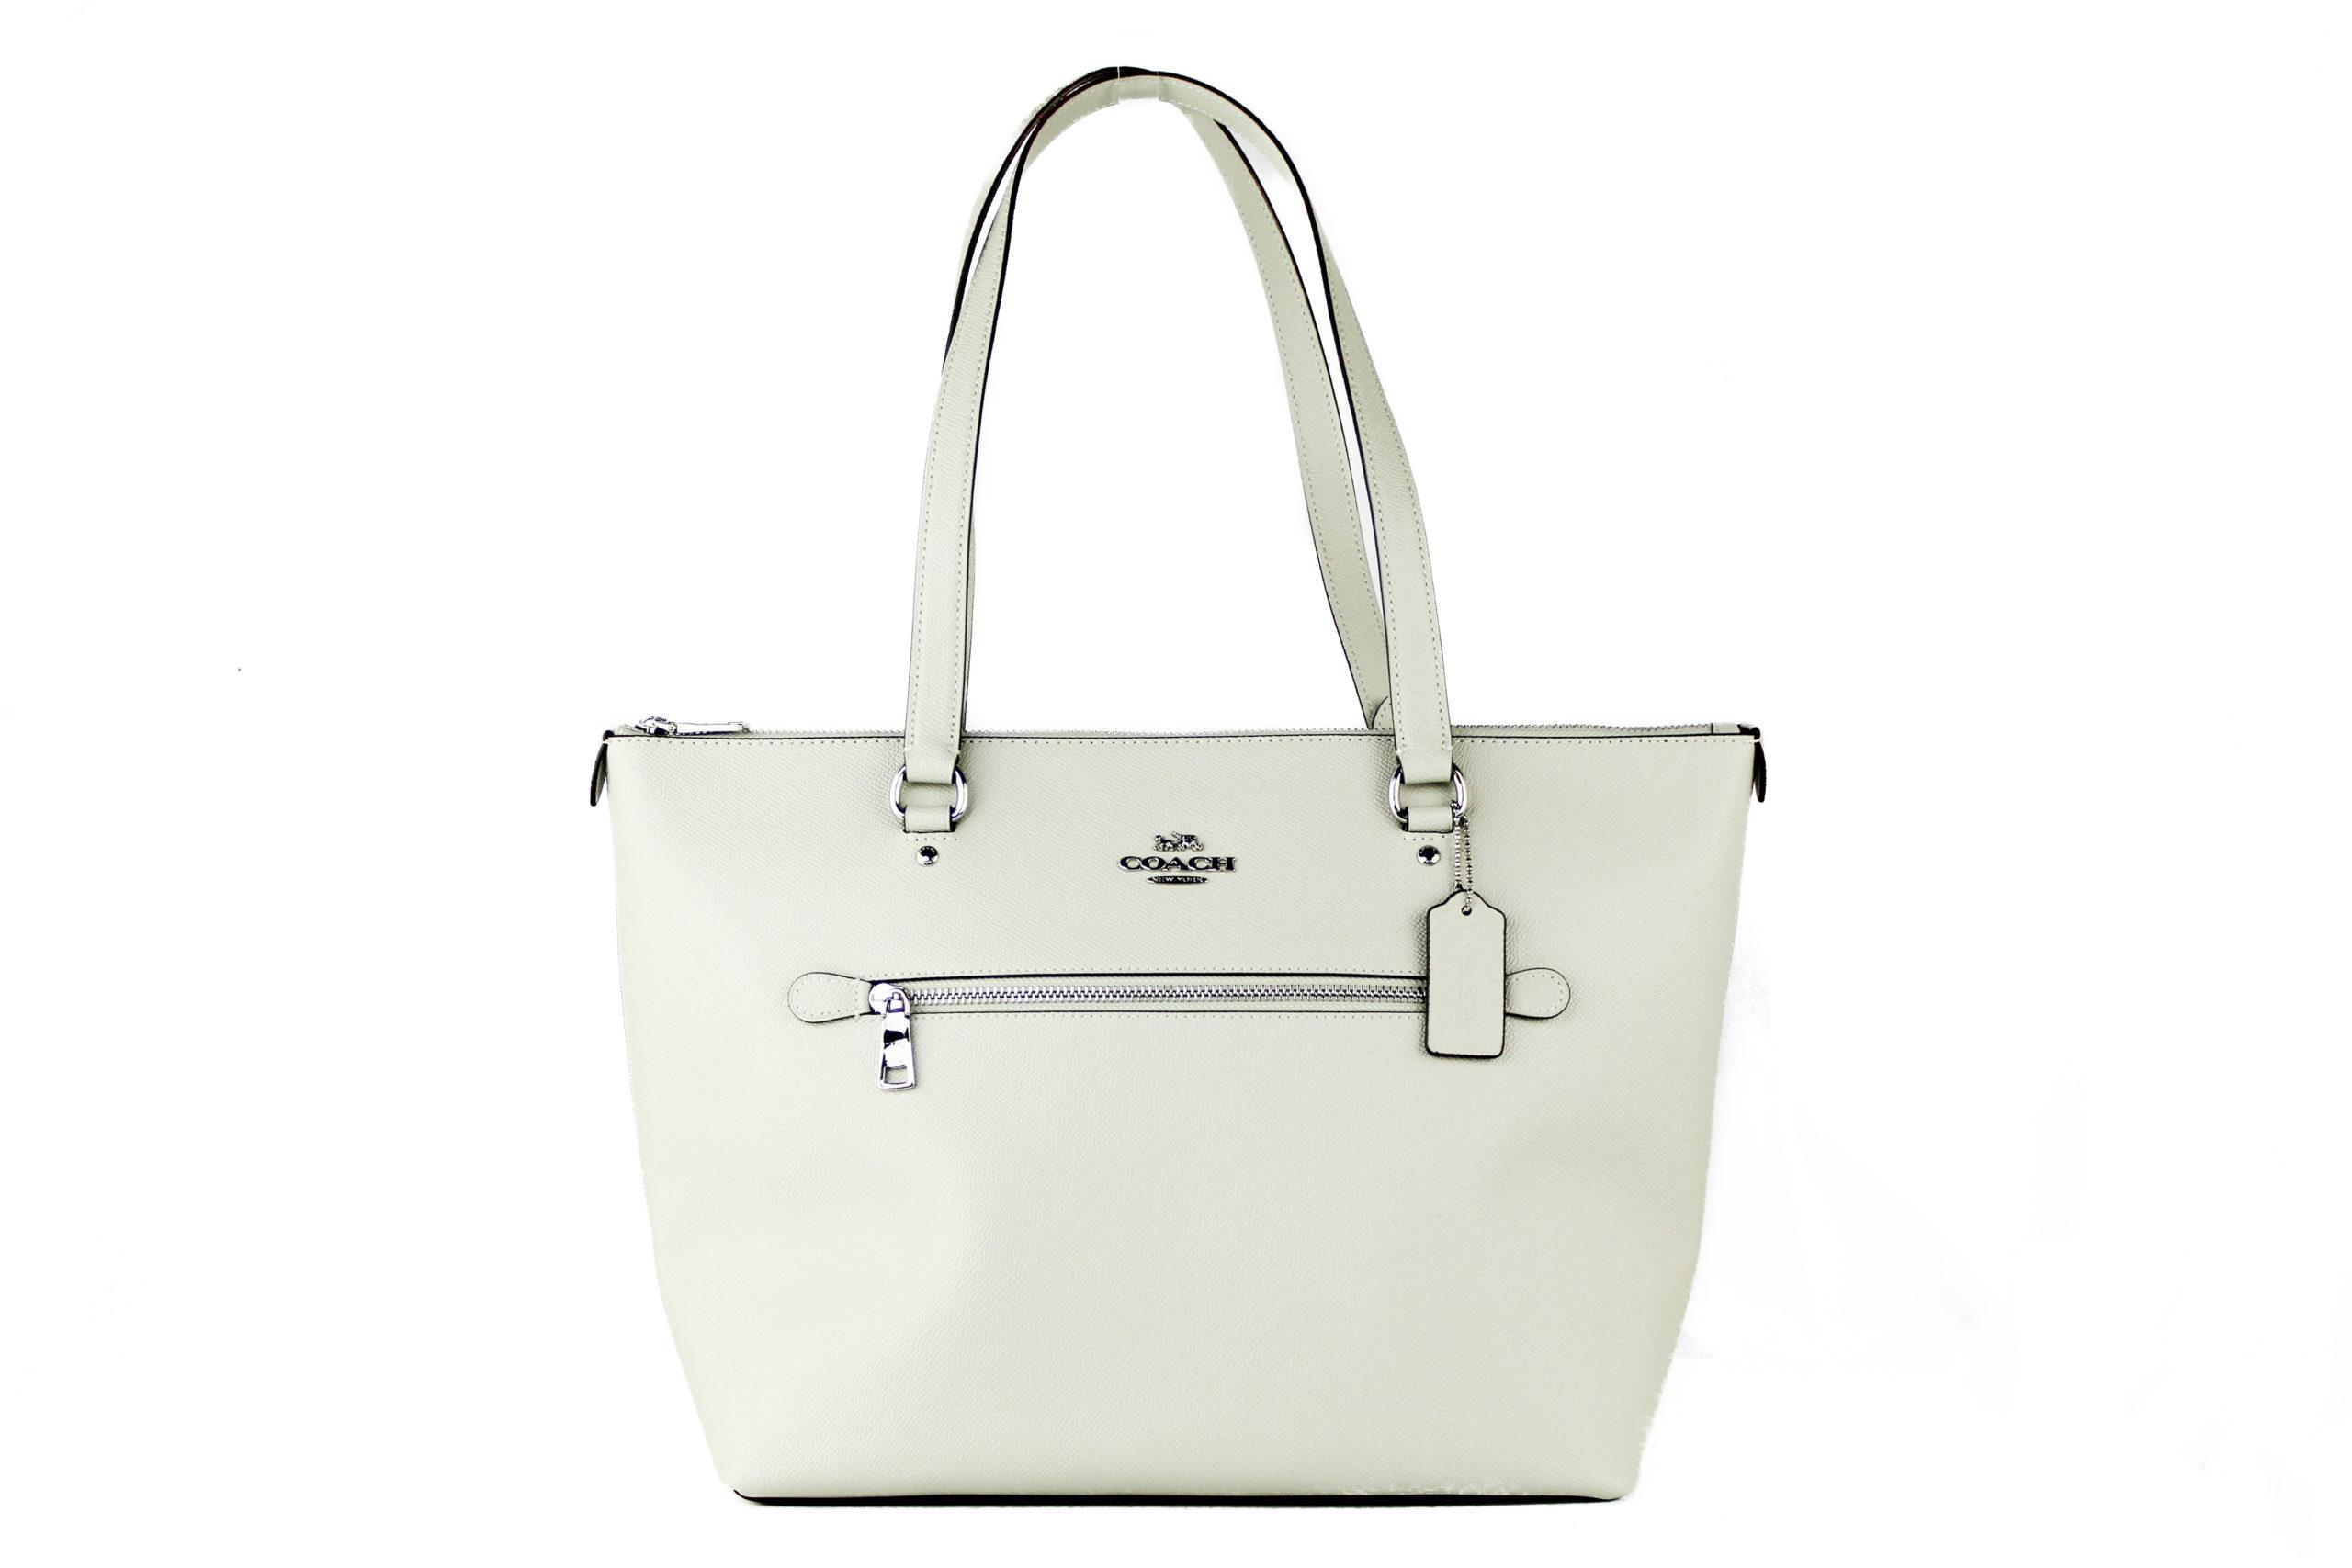 COACH Women's Tote Bag Pale Green 93655